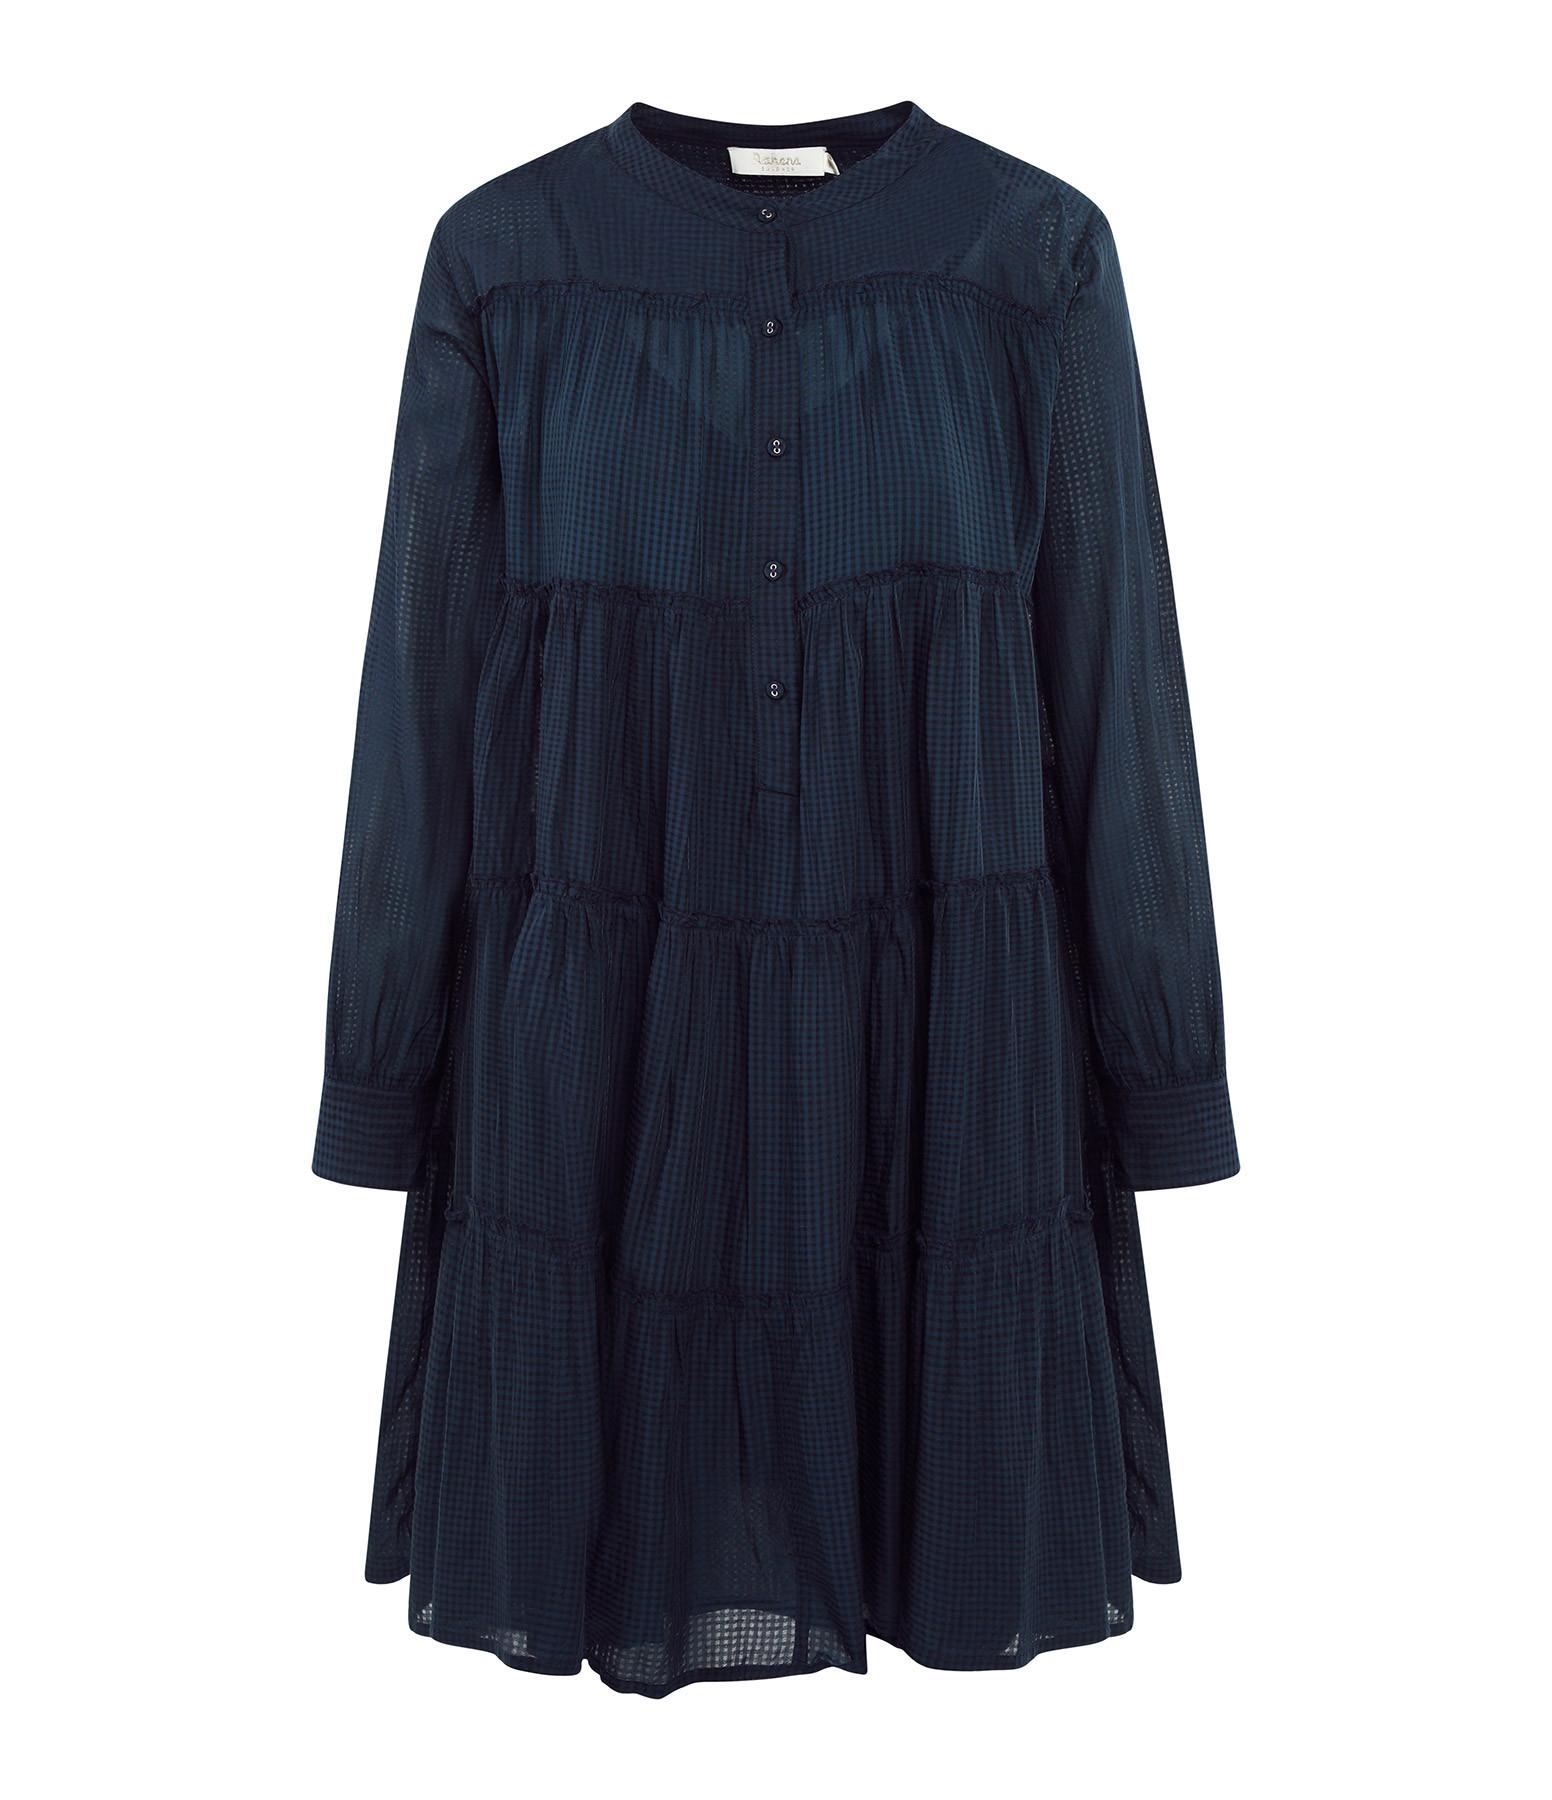 RABENS SALONER - Robe Elya Coton Noir Pirate